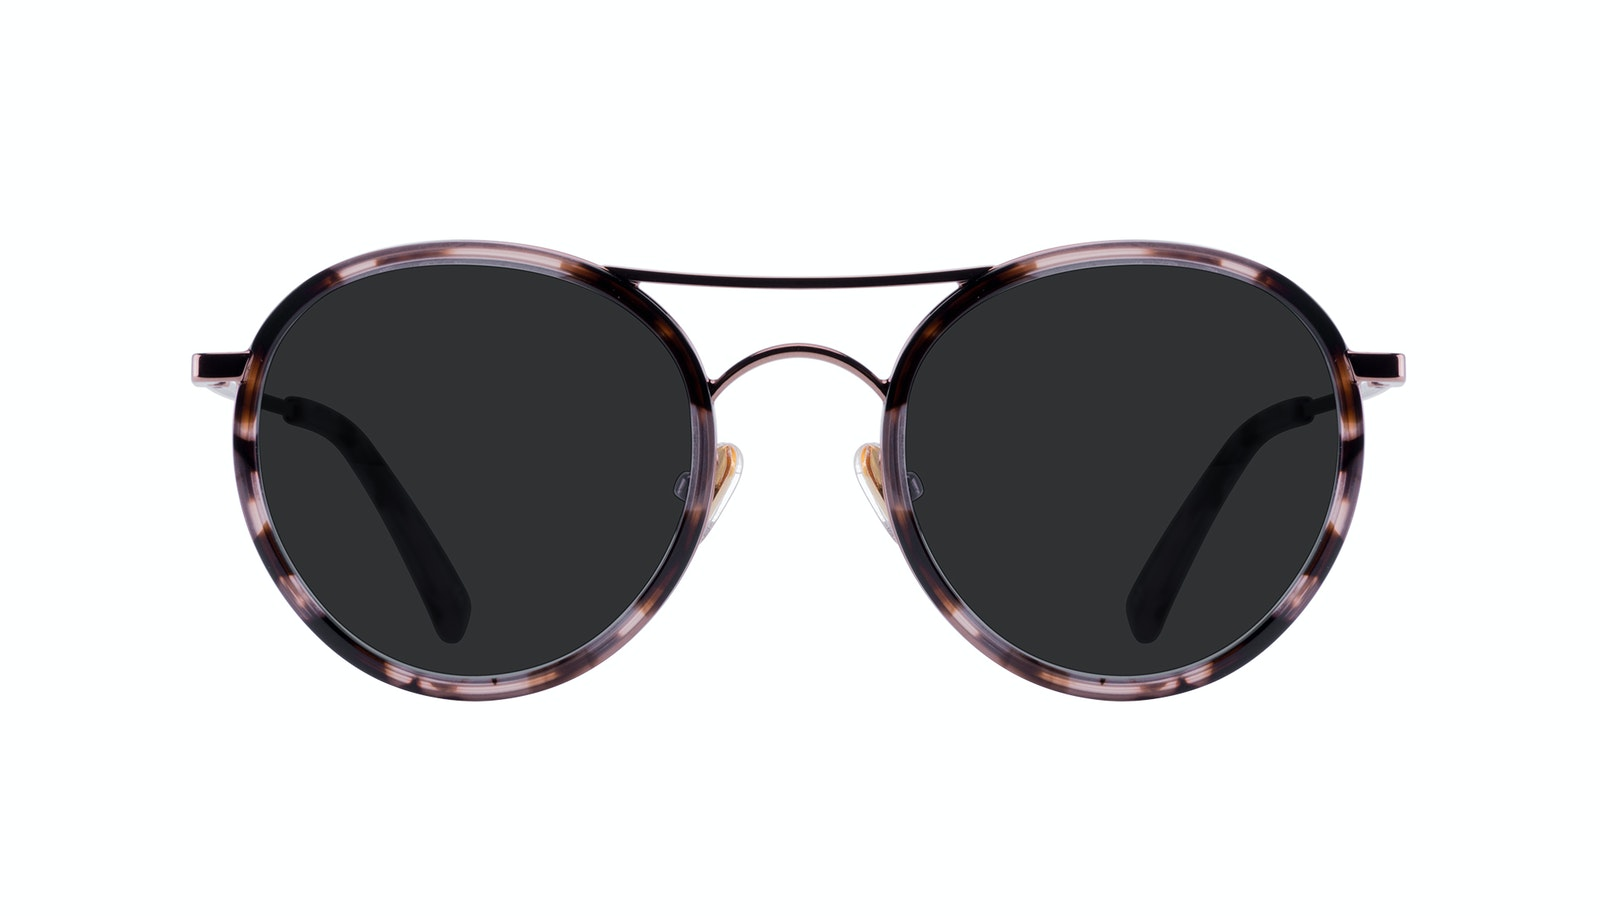 Affordable Fashion Glasses Aviator Round Sunglasses Women Dawn Pink Tortoise